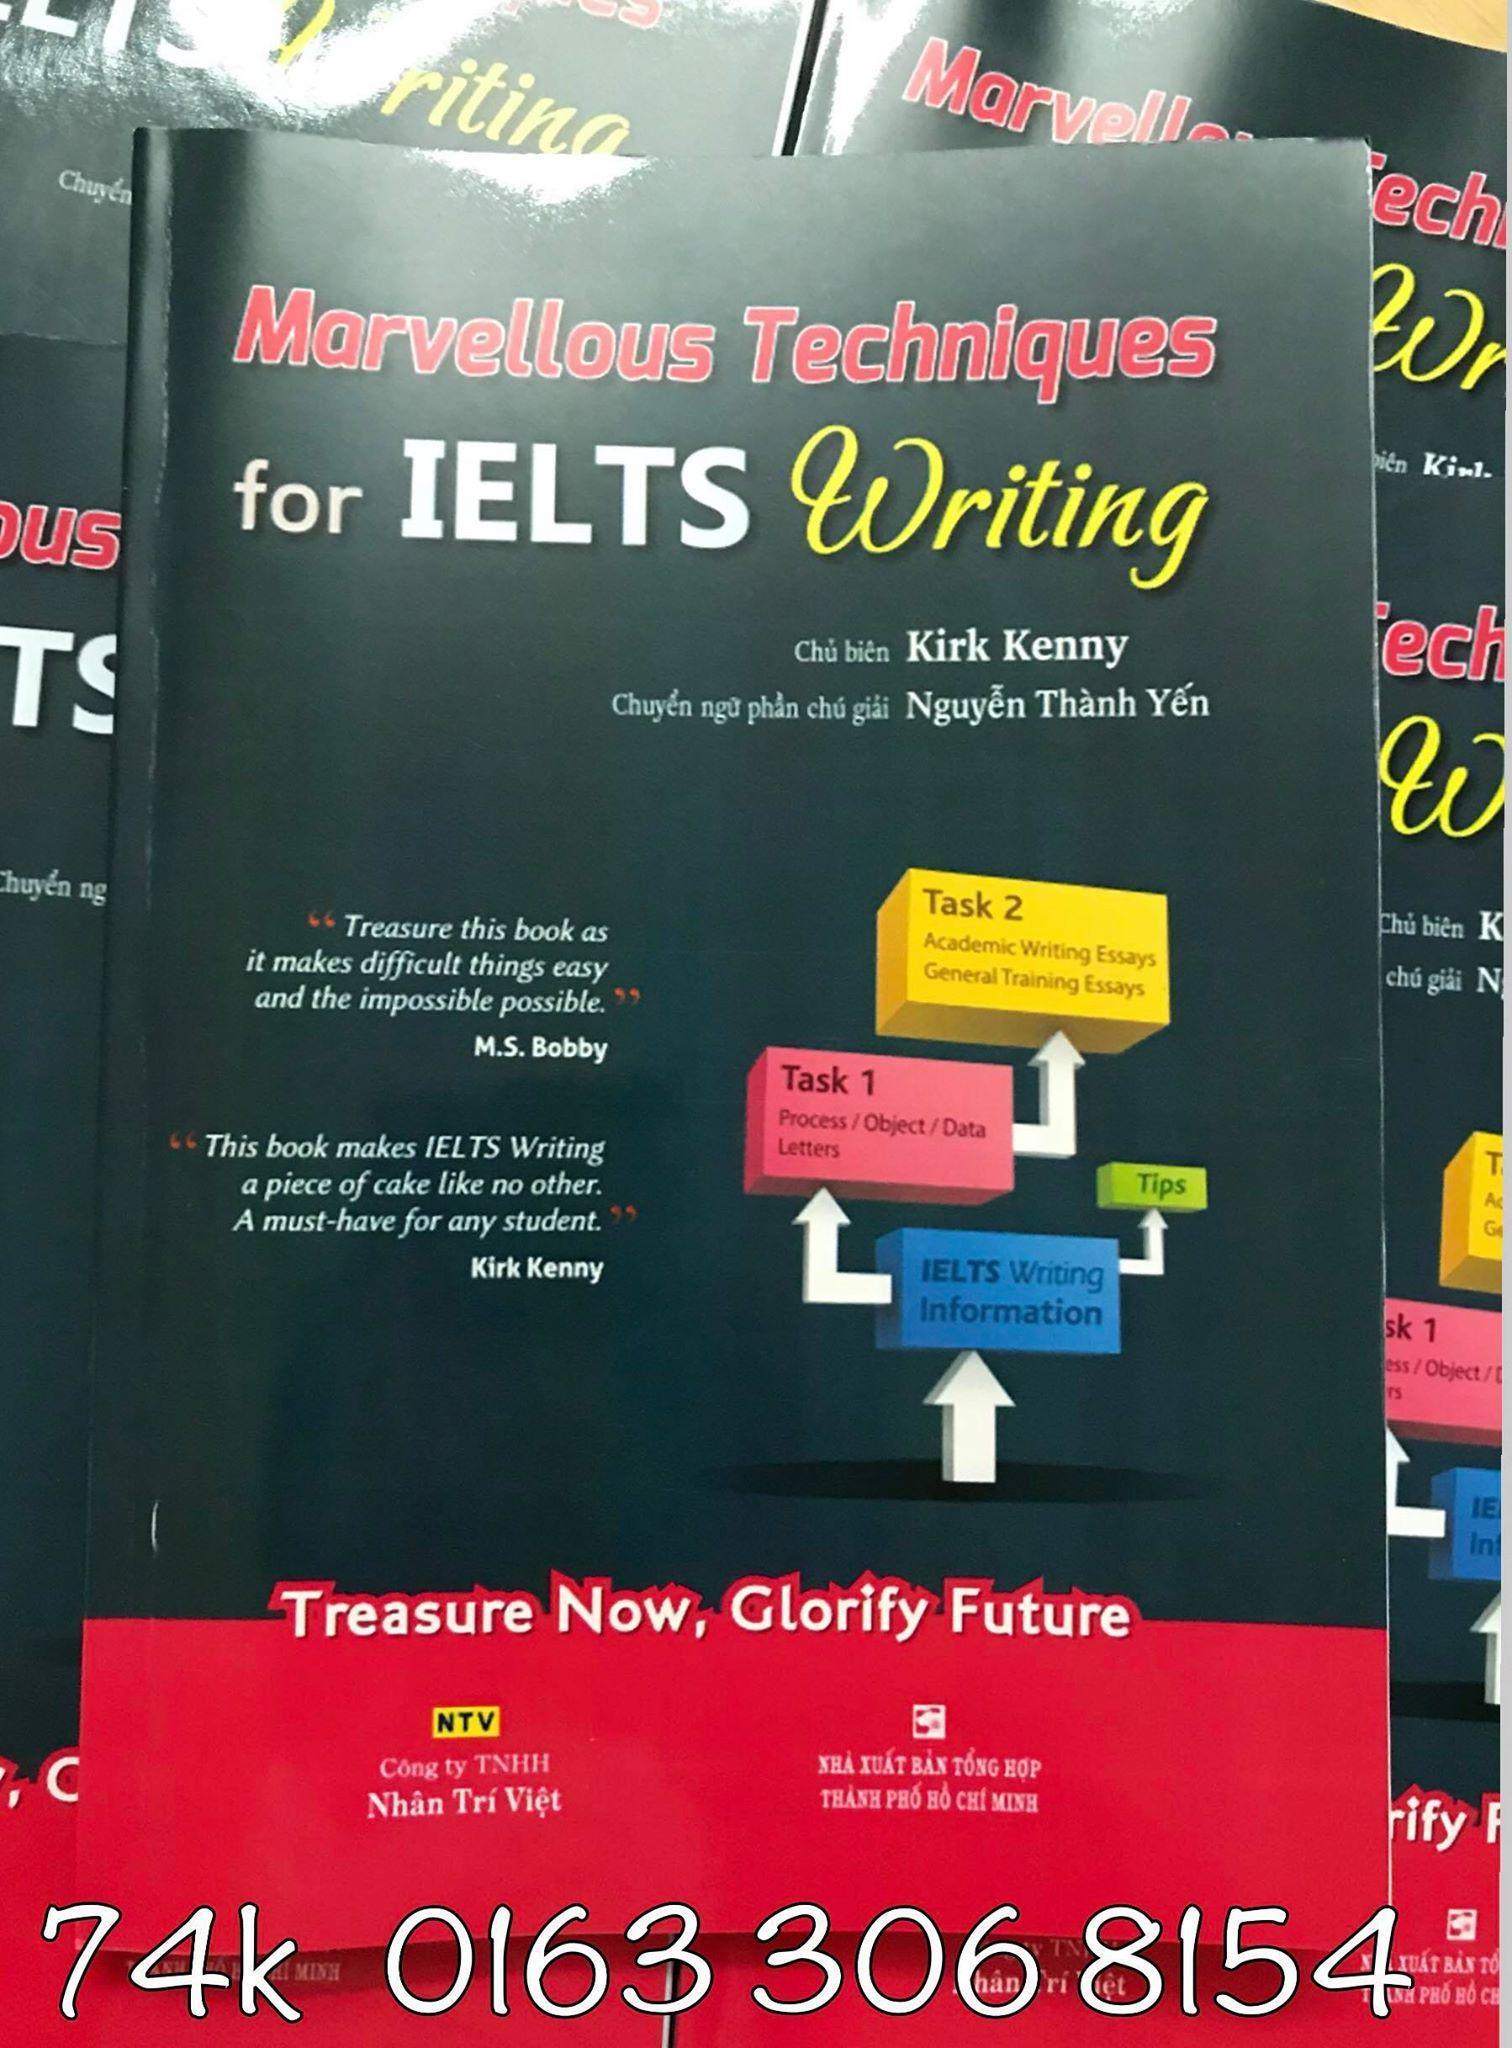 Marvellous Techniques For Ielts Writing Giá Ưu Đãi Nhất